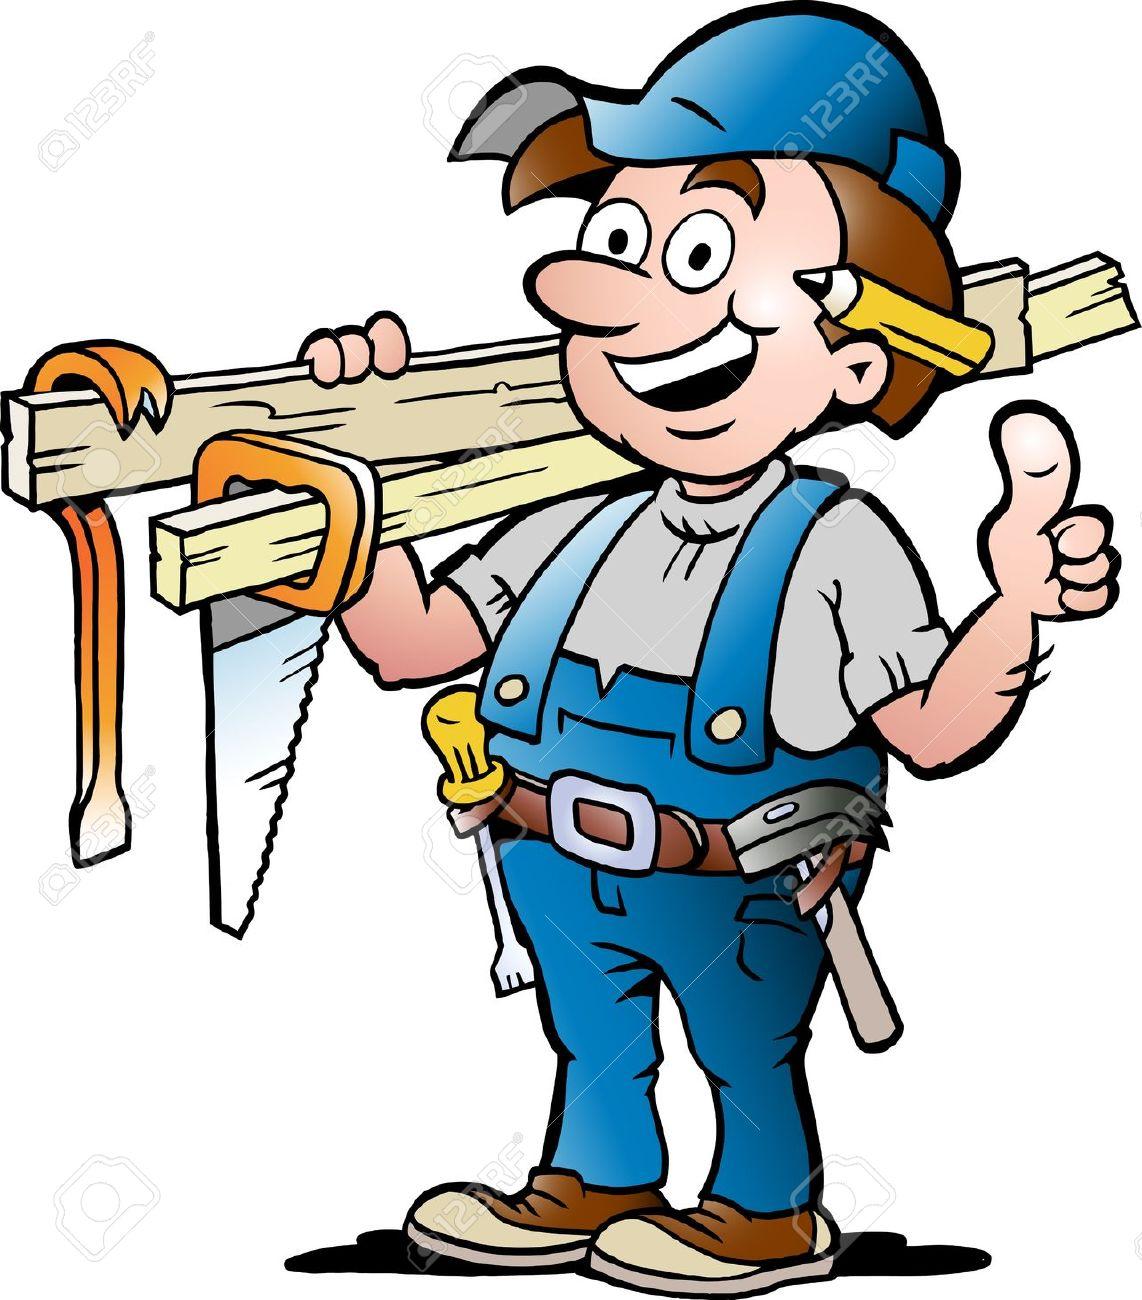 Woman clipart carpenter Carpenter  Clipart